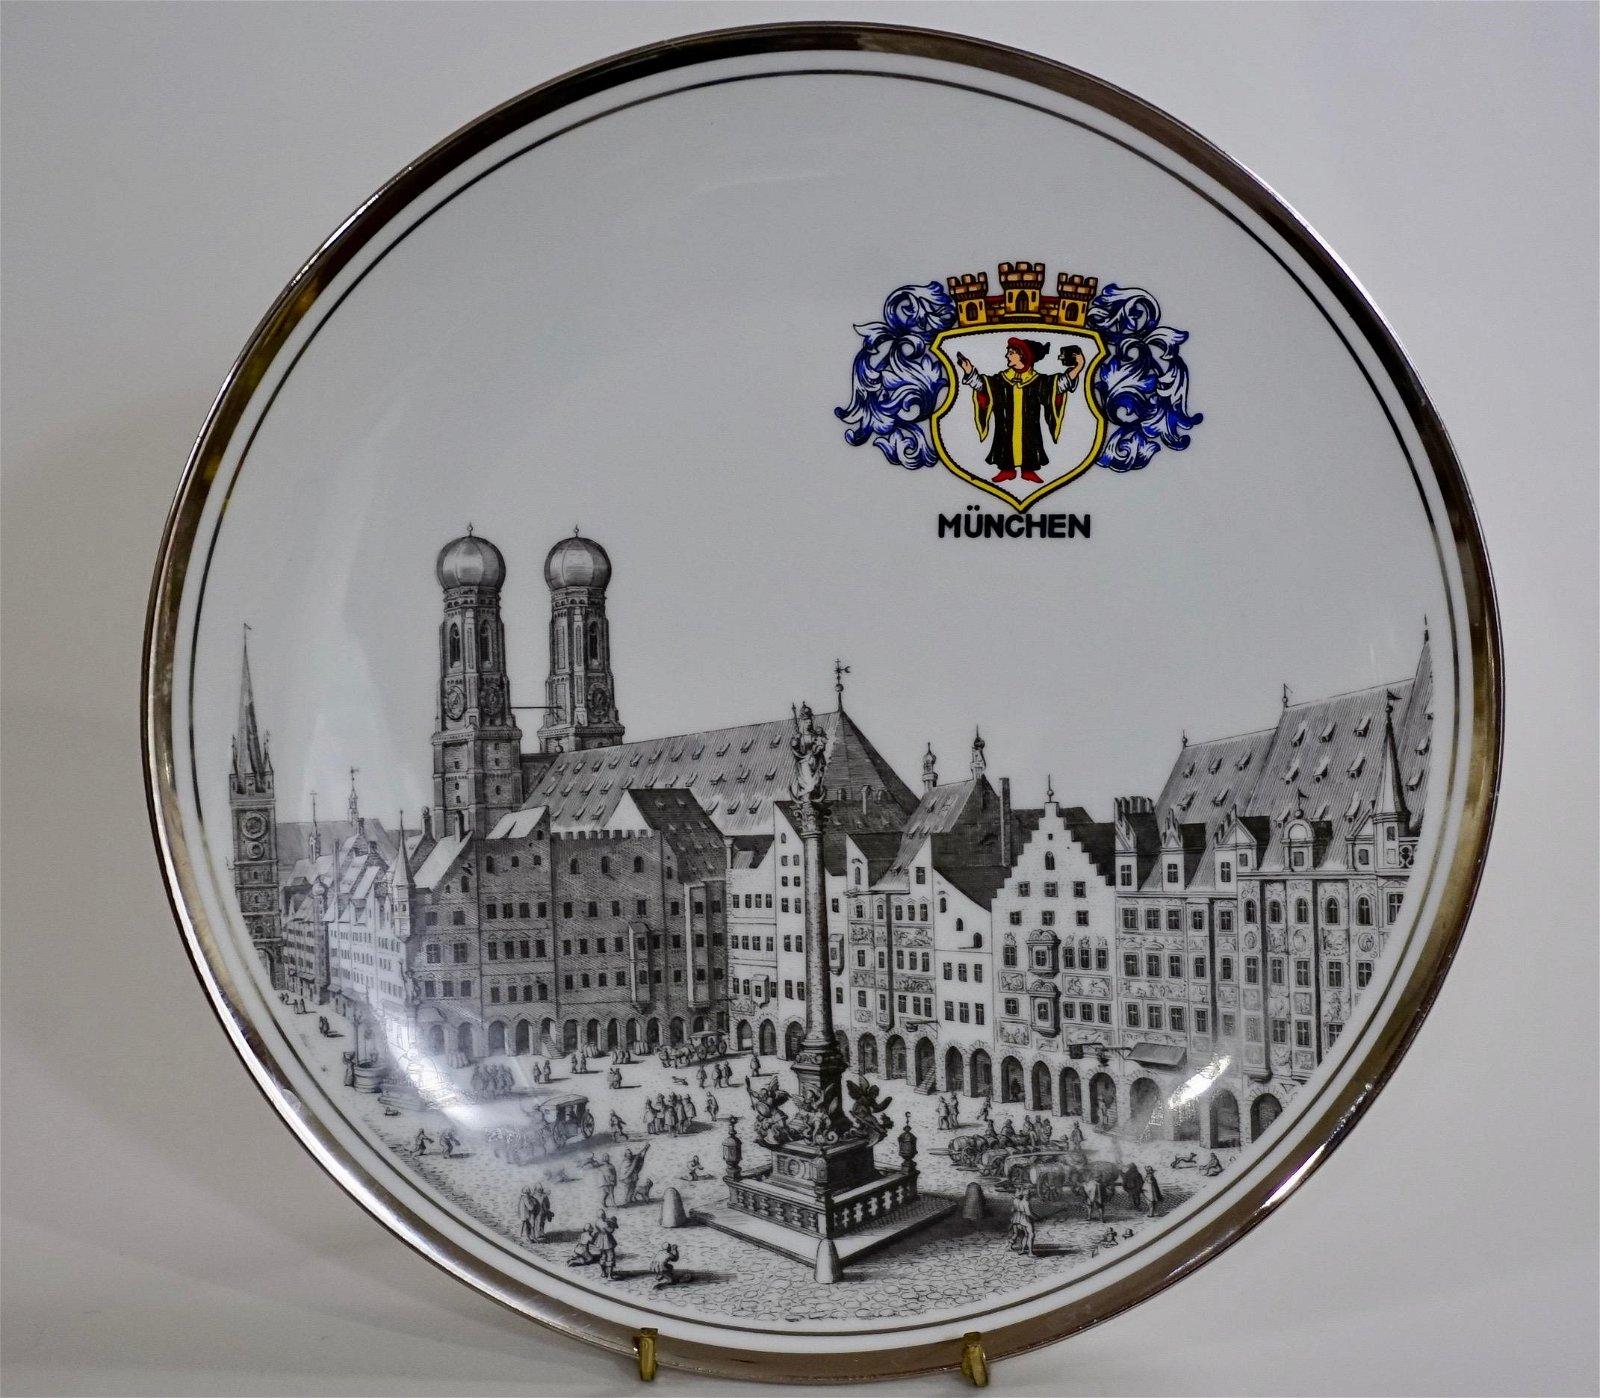 Munchen Architectural Porcelain Plate Munich Germany